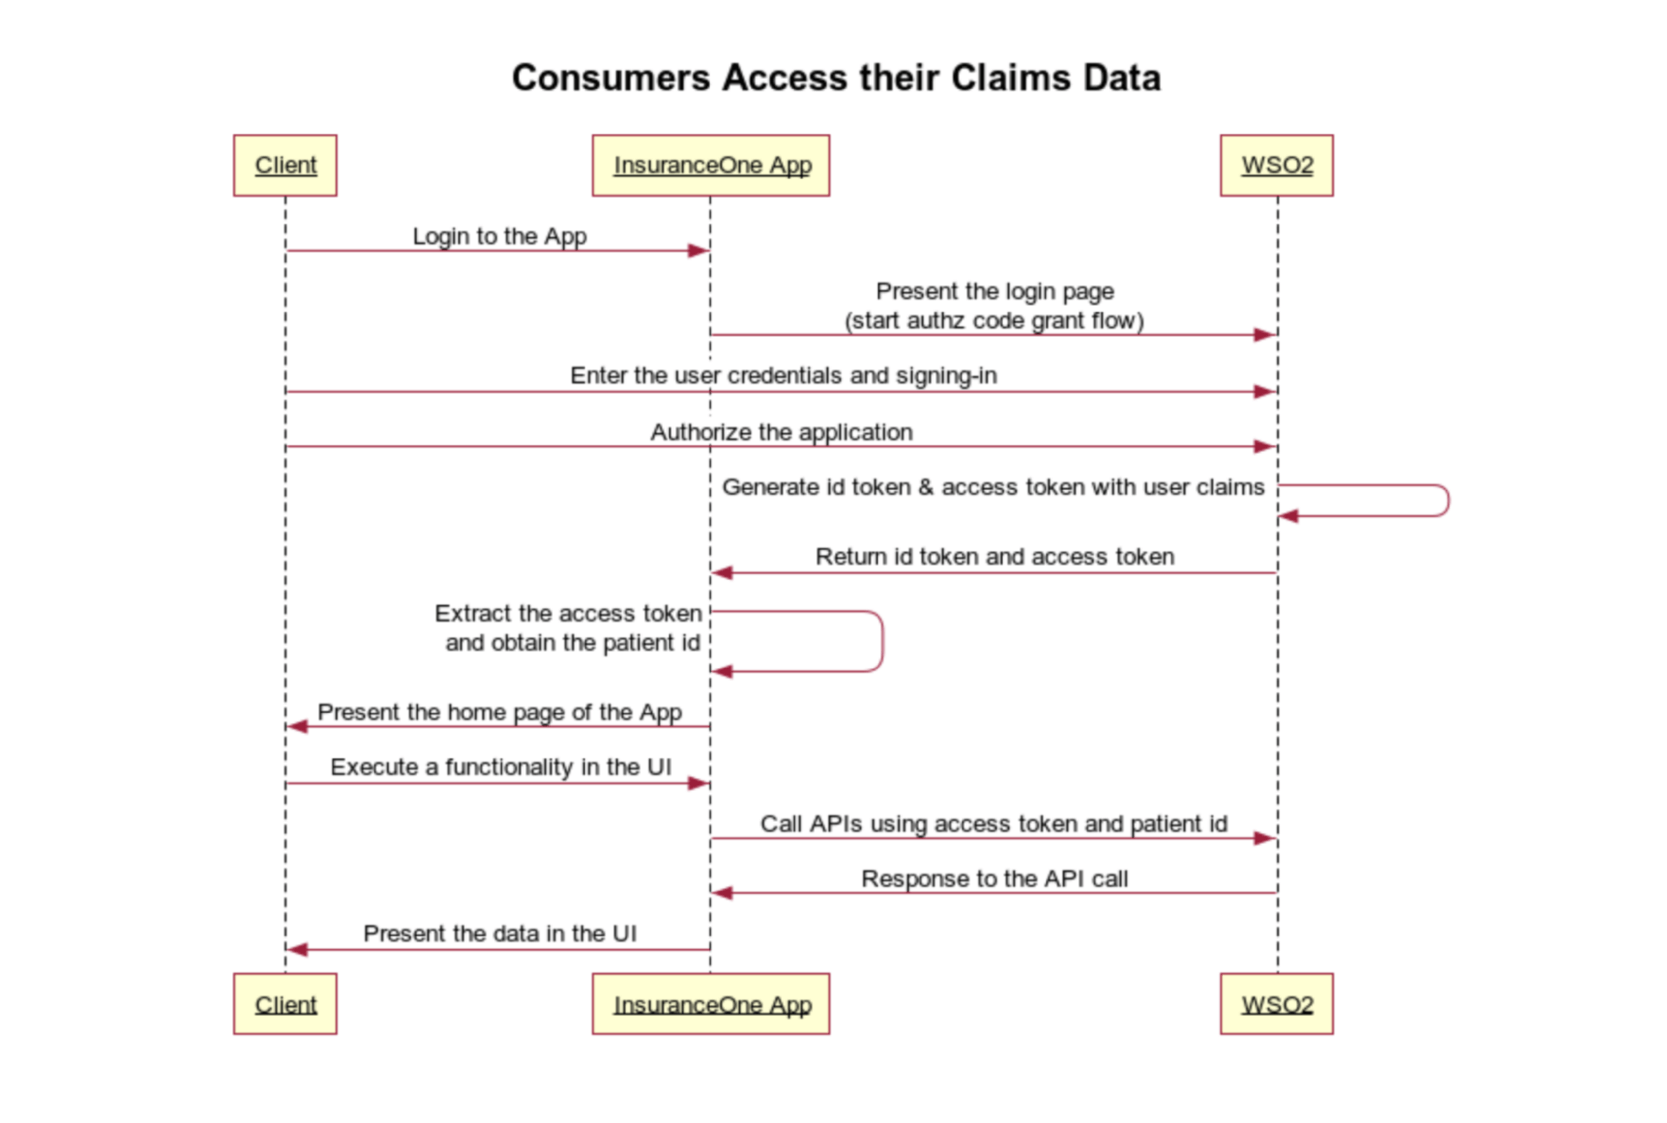 Use Case - Sequence diagram